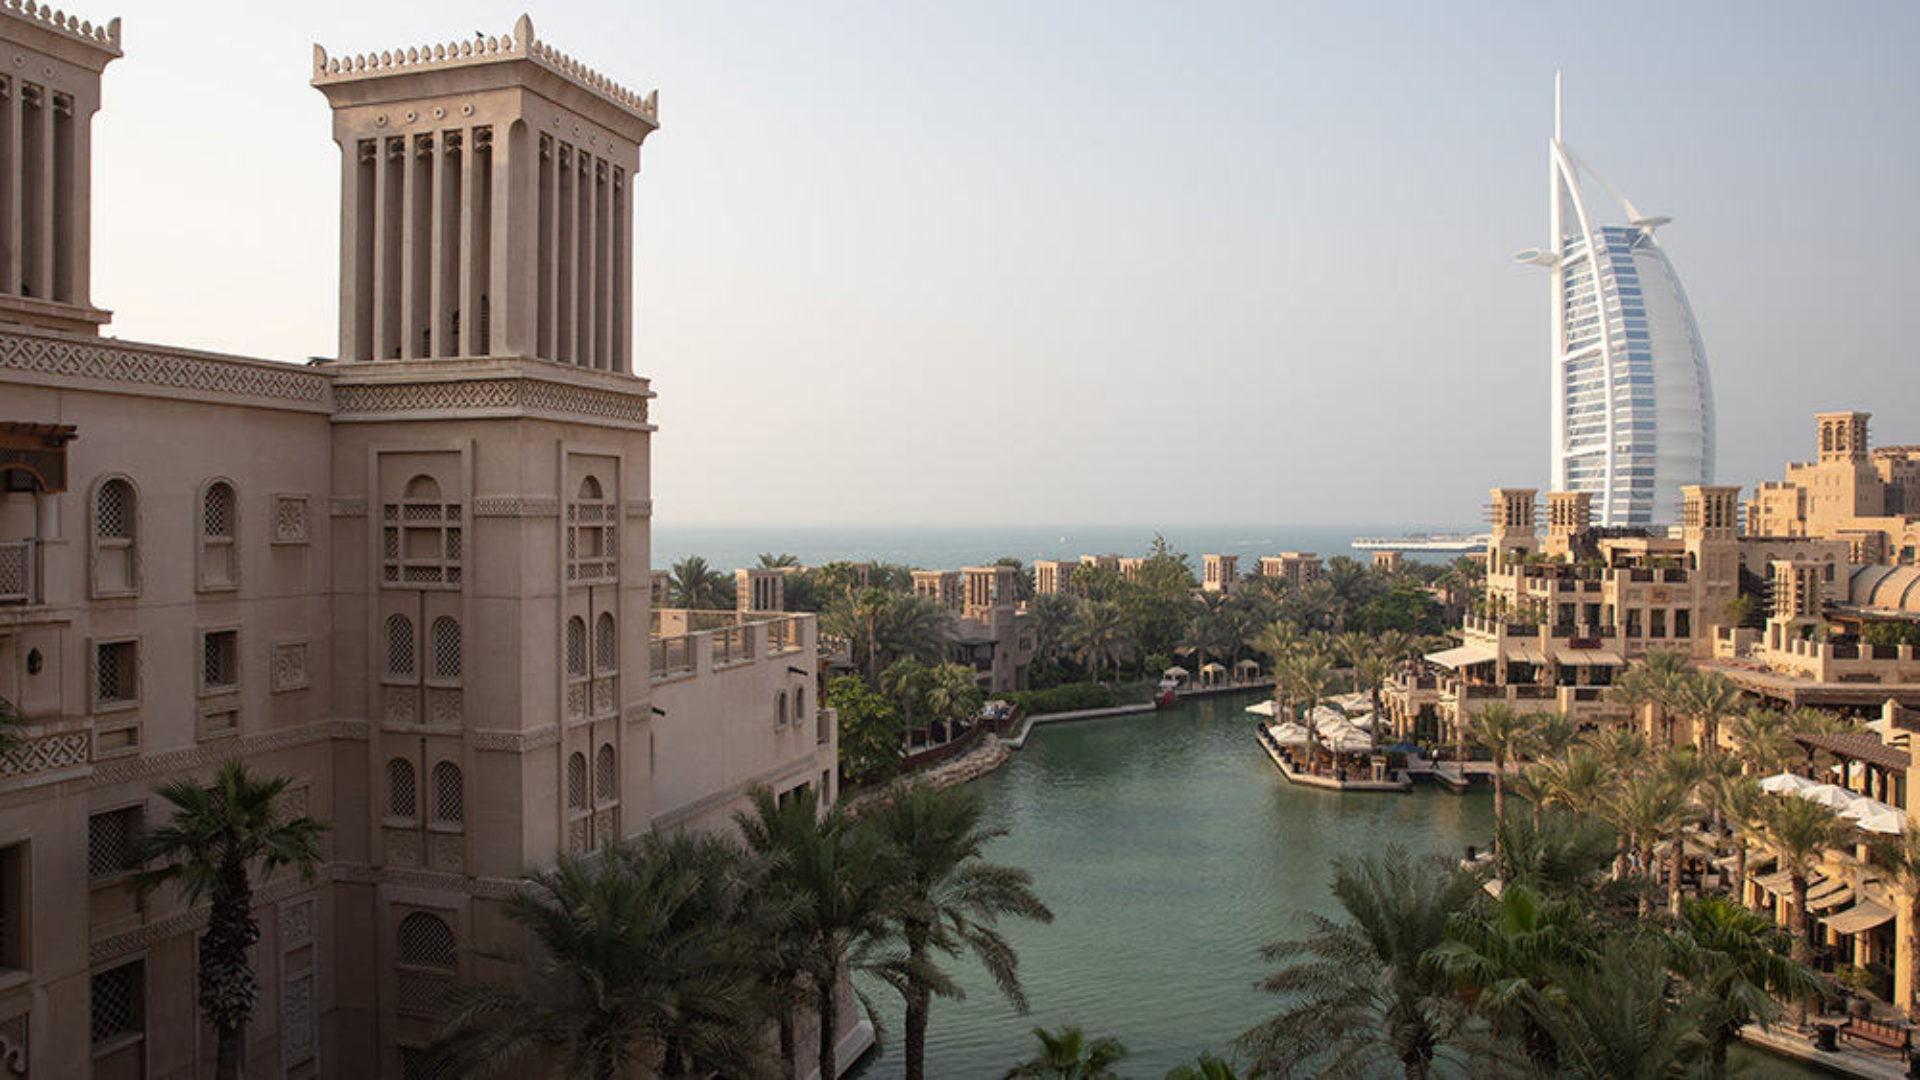 Aerial view of Jumeirah Dar Al Masyaf with Burj Al Arab